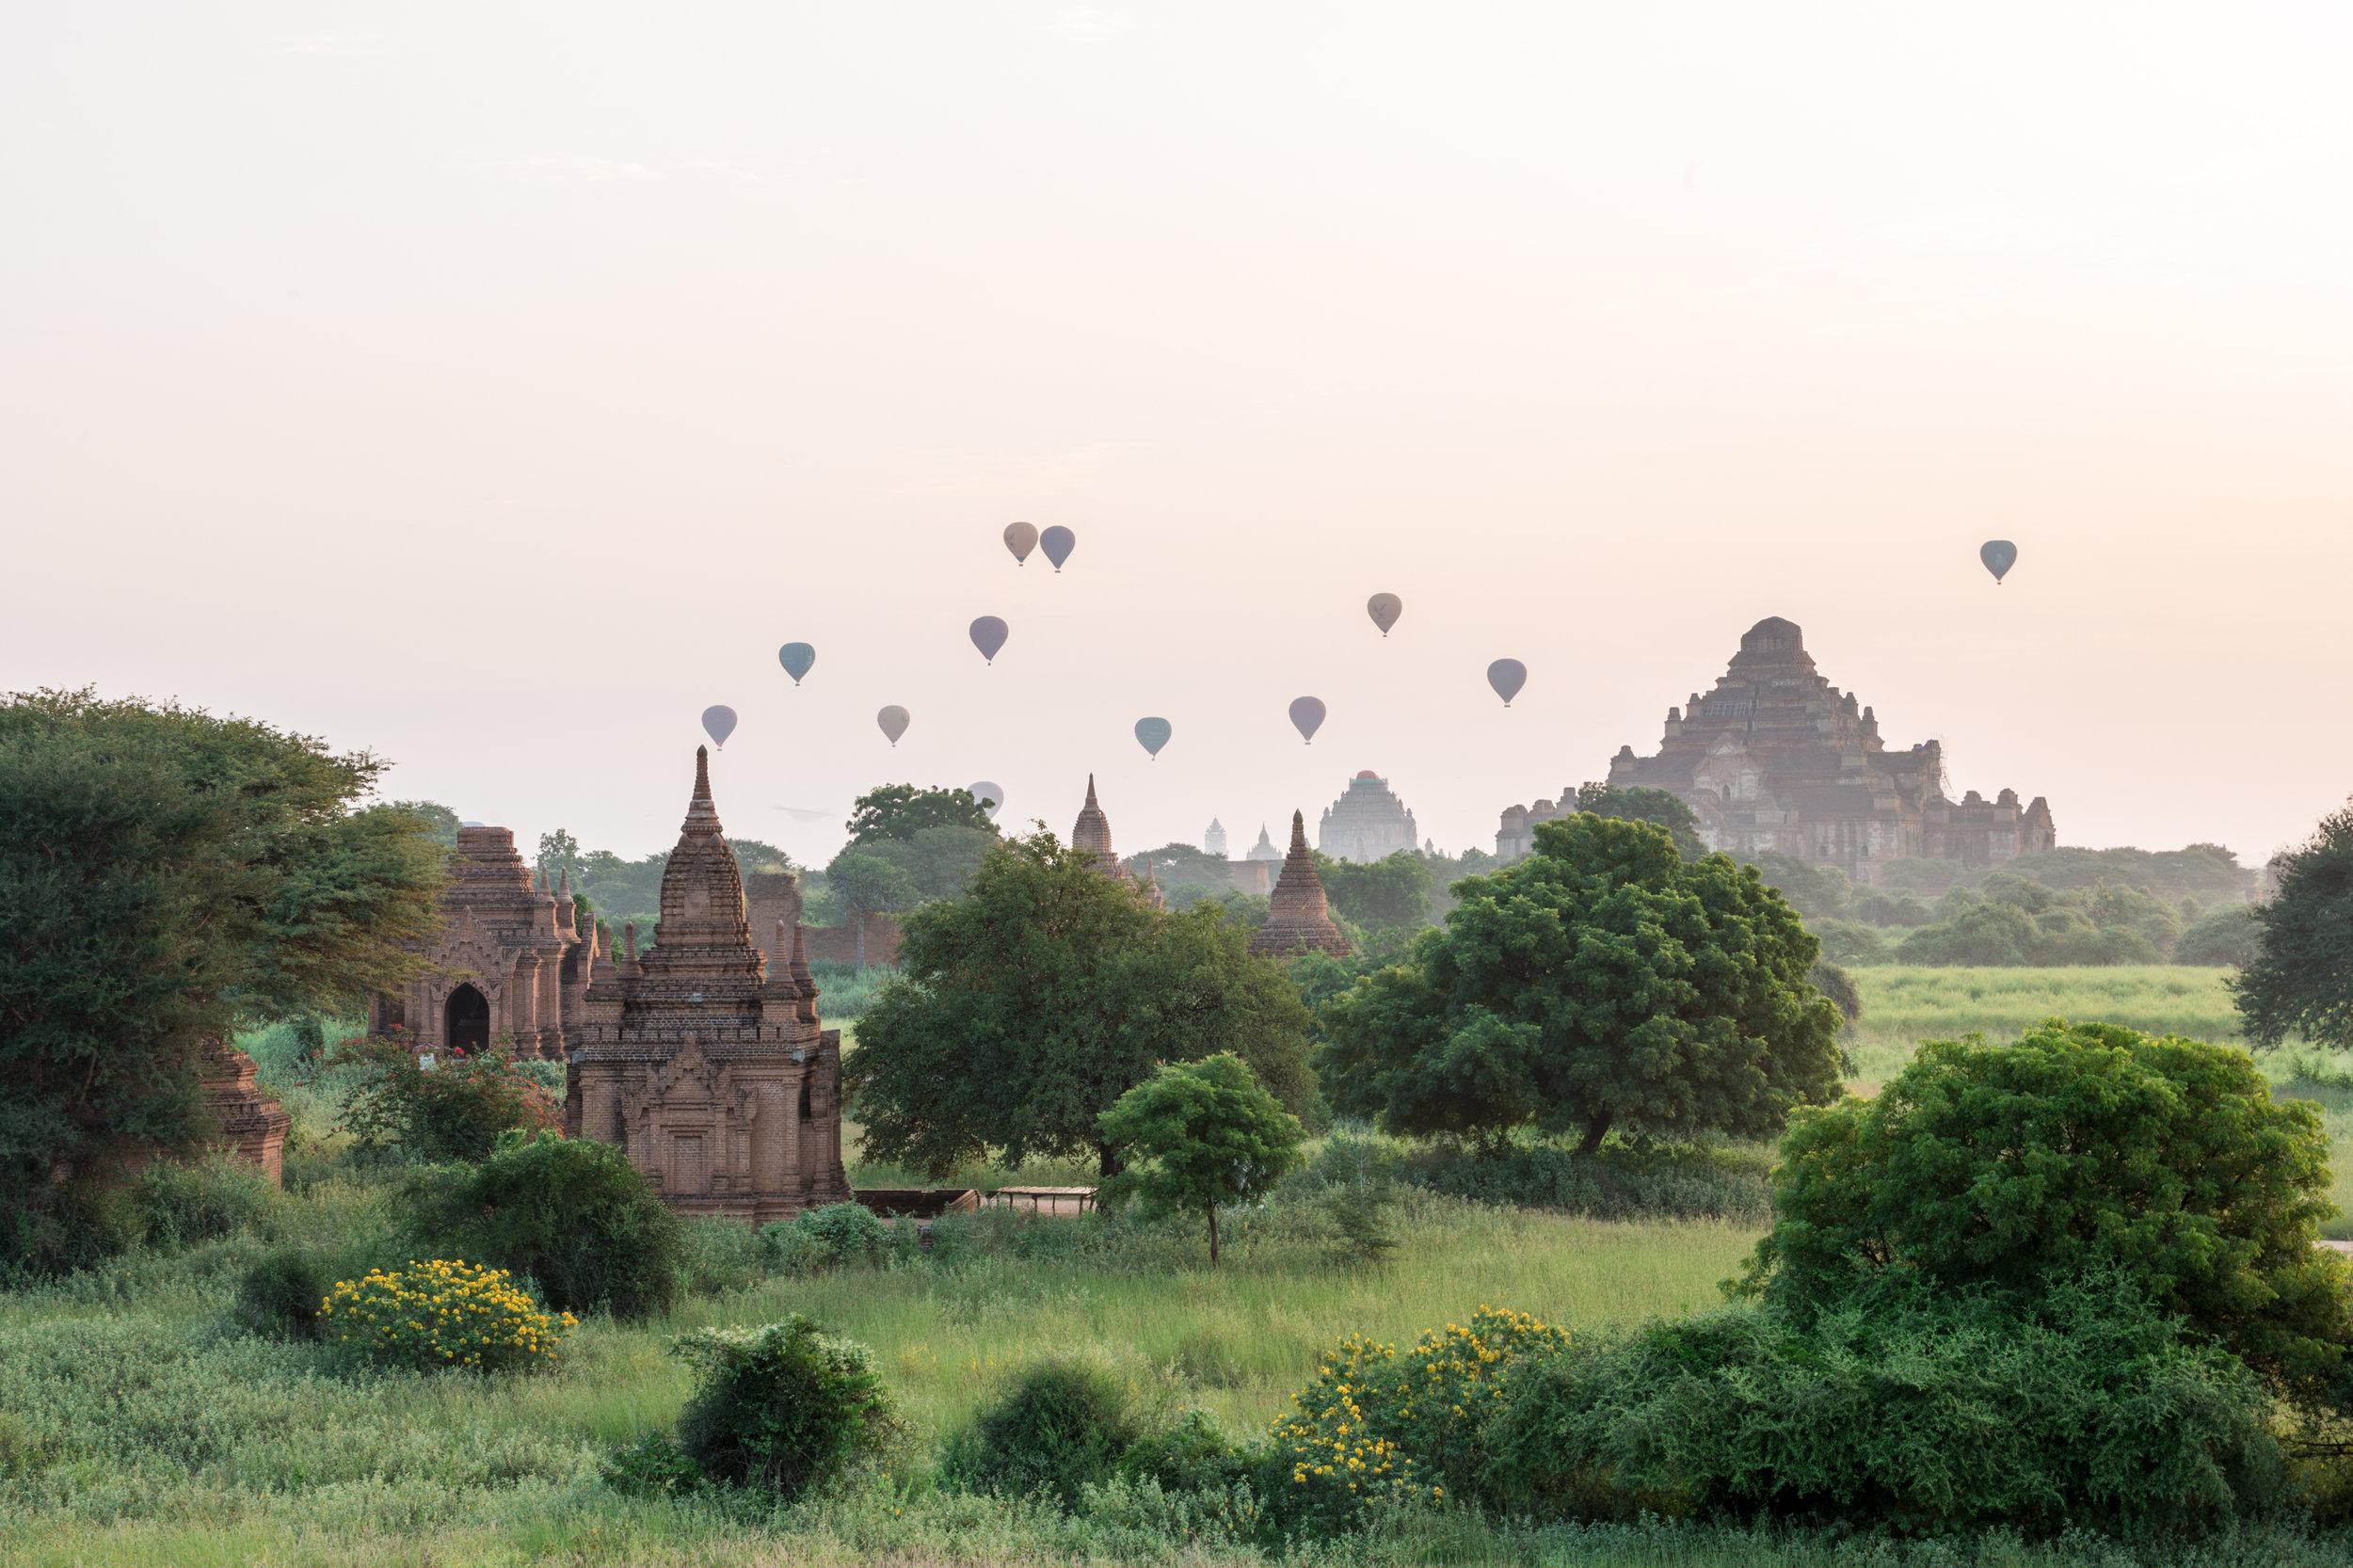 Ballons_Bagan_-1.jpg